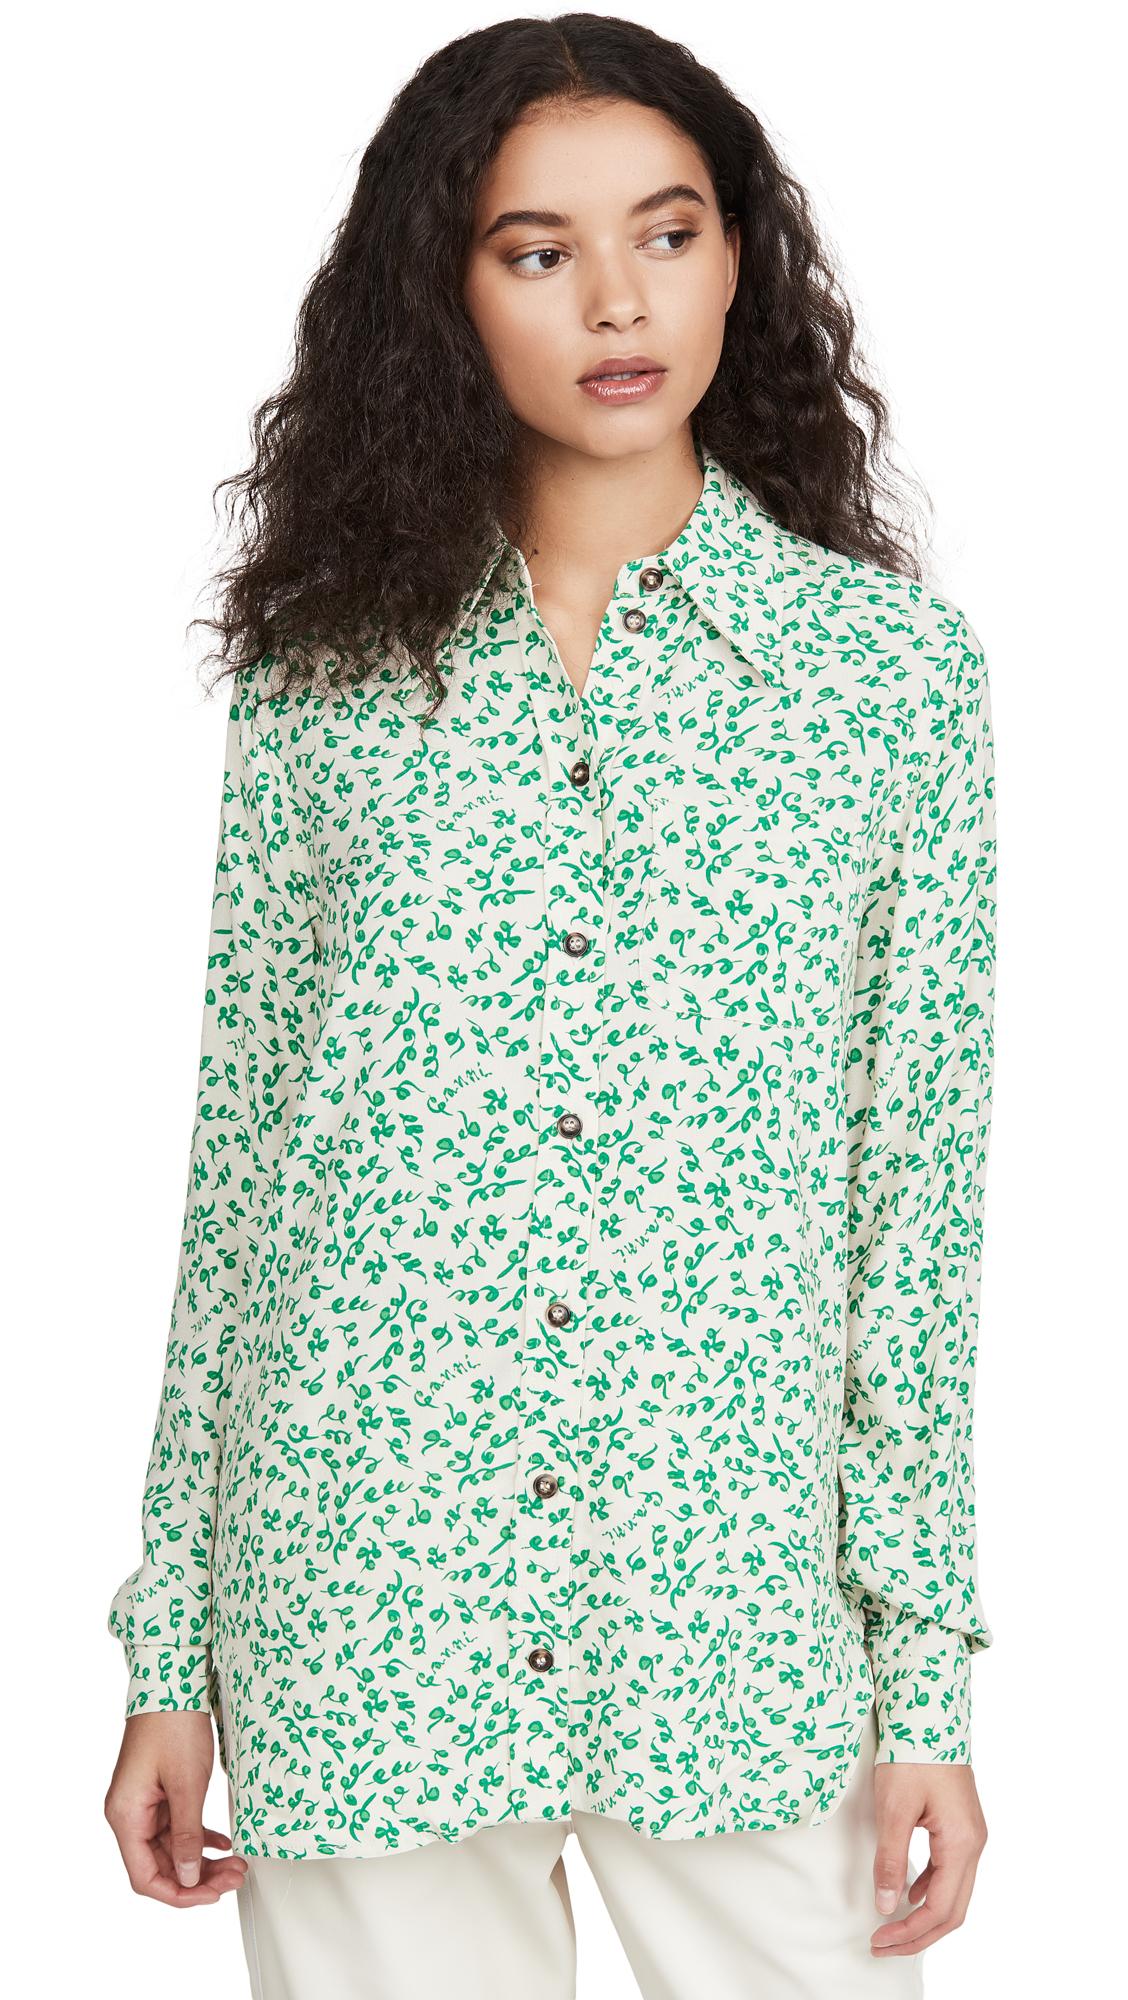 GANNI Printed Crepe Button Down Shirt - 30% Off Sale